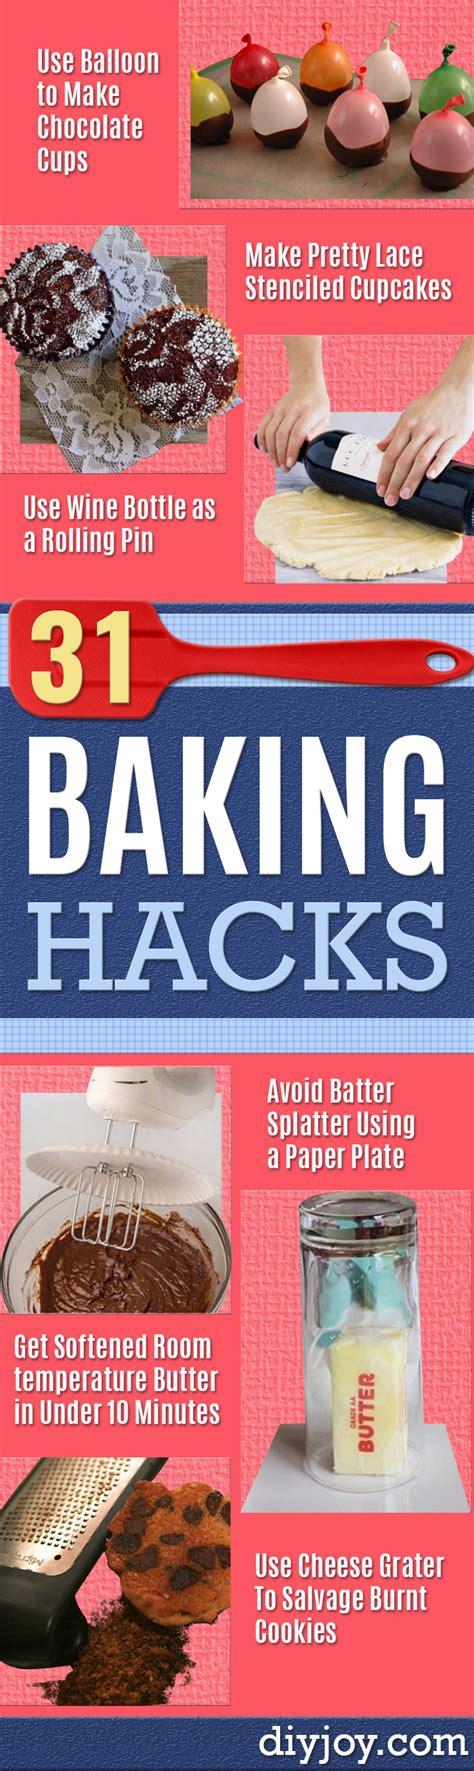 baking hacks 31 baking hacks you ll wish you knew before now